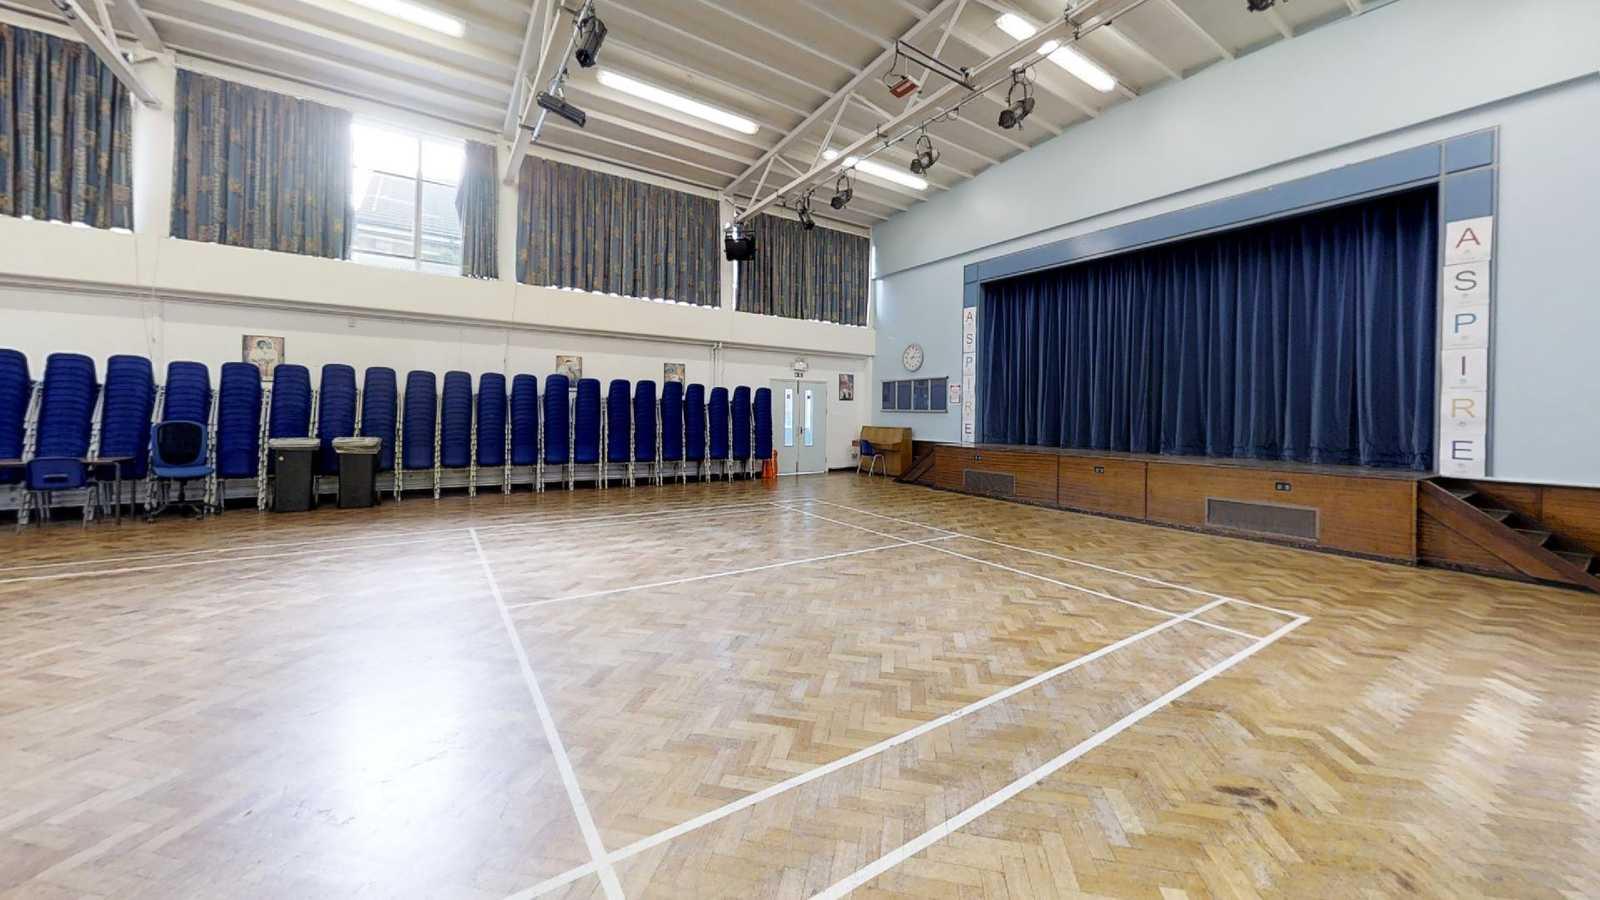 Wiseman main hall